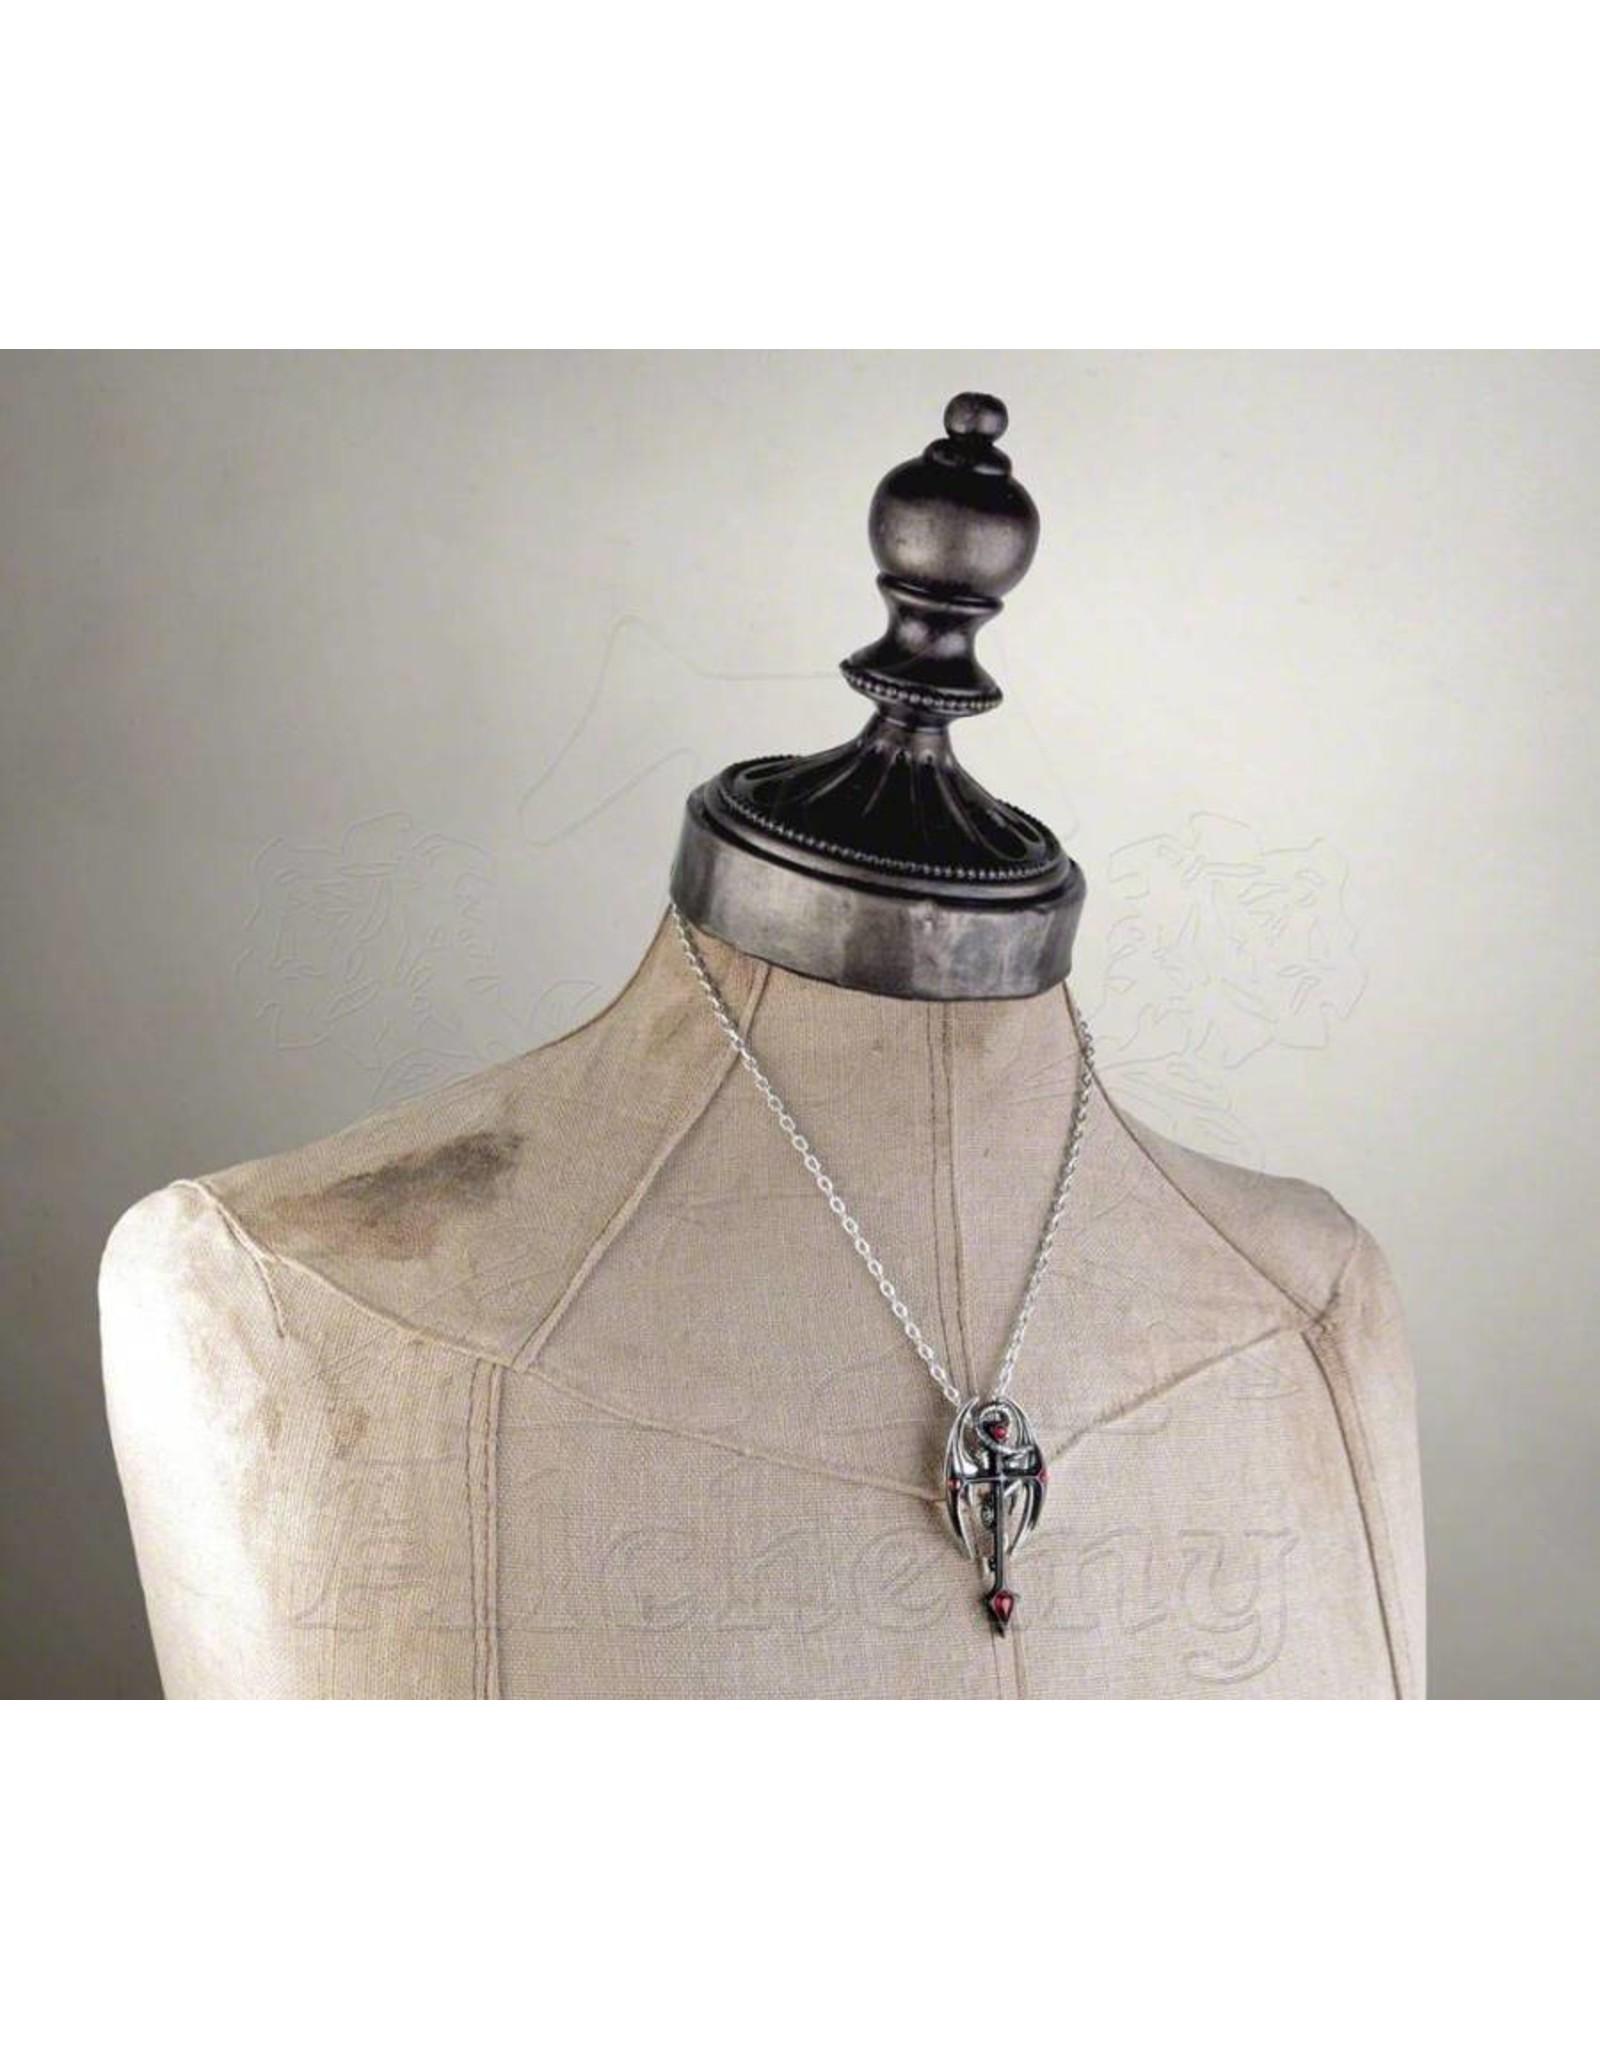 Alchemy Gothic jewellery and accessories - Dragonkreuz pendant and chain Alchemy